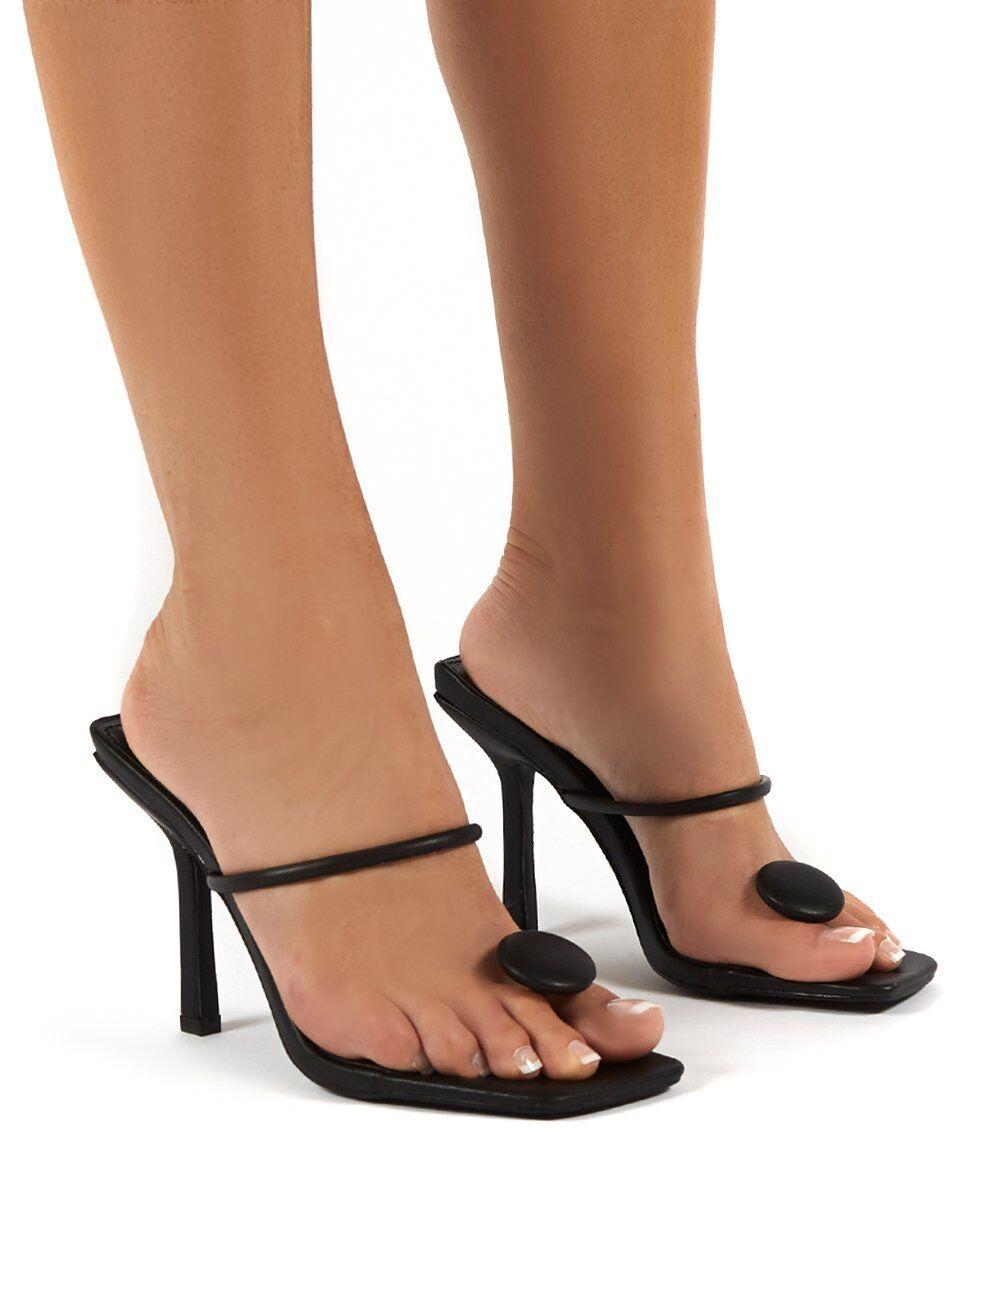 Public Desire USA Kai Black Toe Post Square Toe Mule Heels - US 6